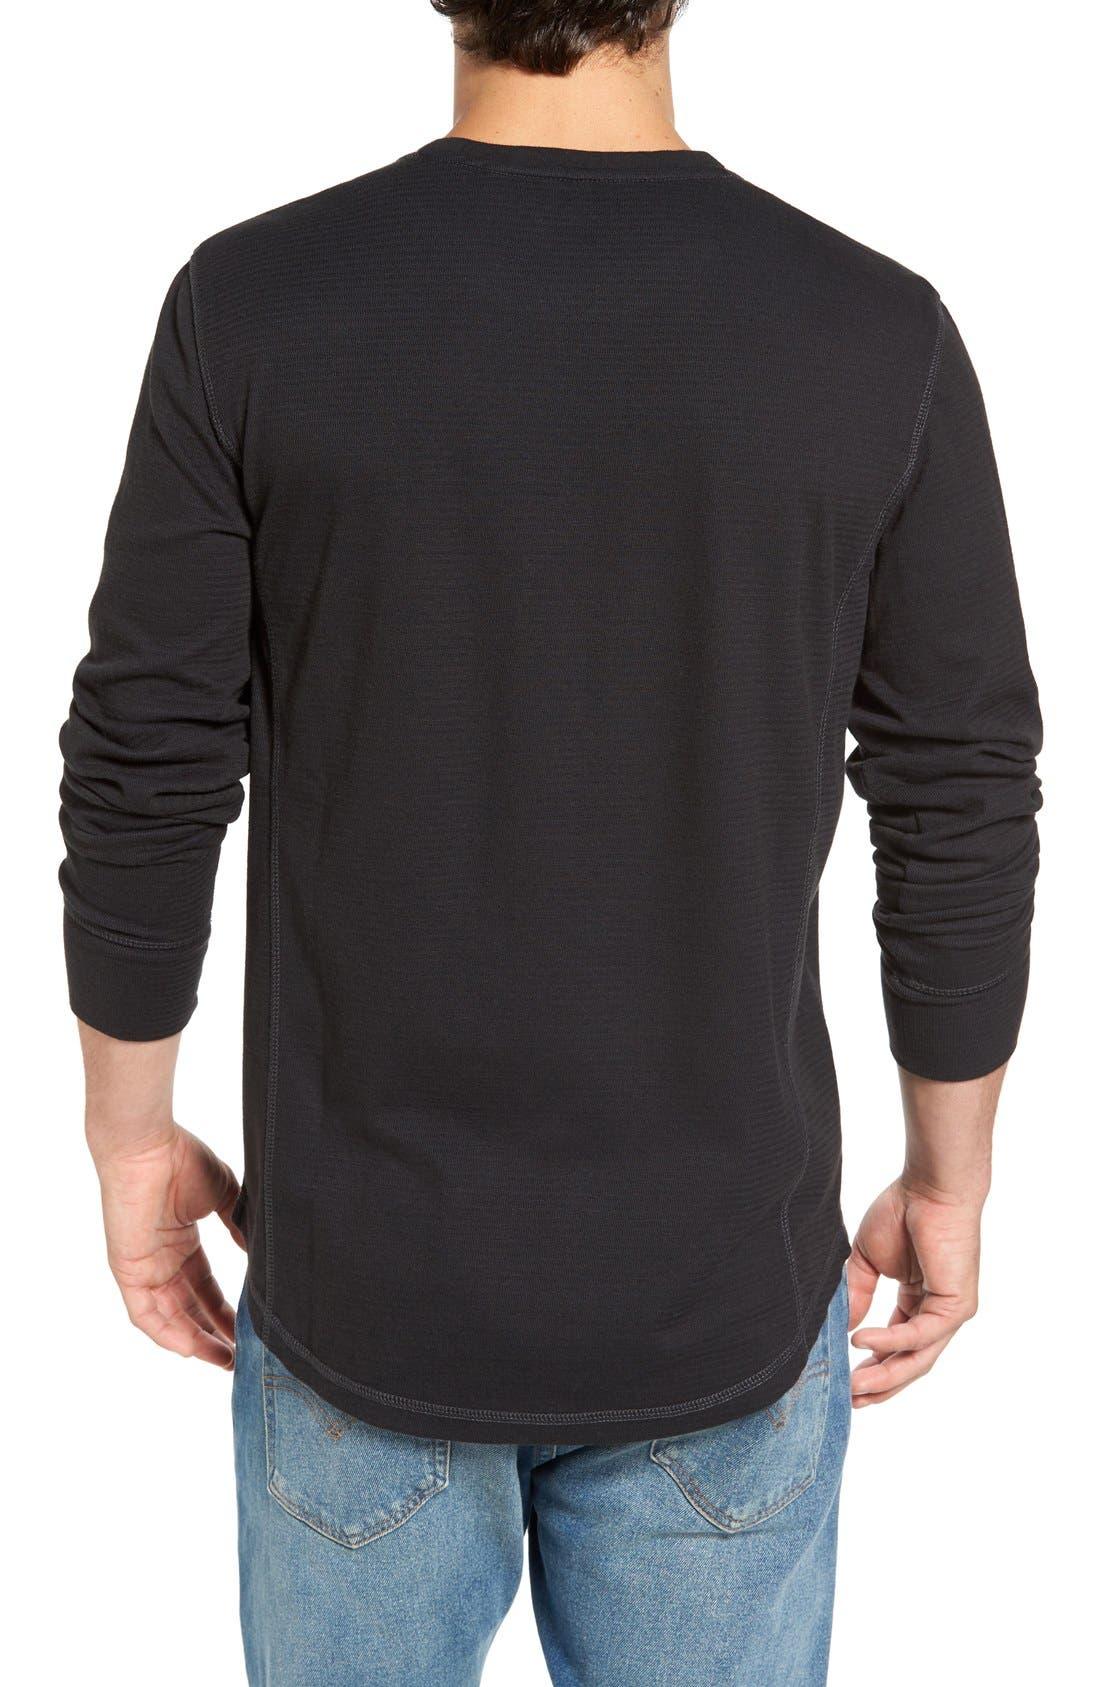 Larsen Zigzag Thermal T-Shirt,                             Alternate thumbnail 2, color,                             Black